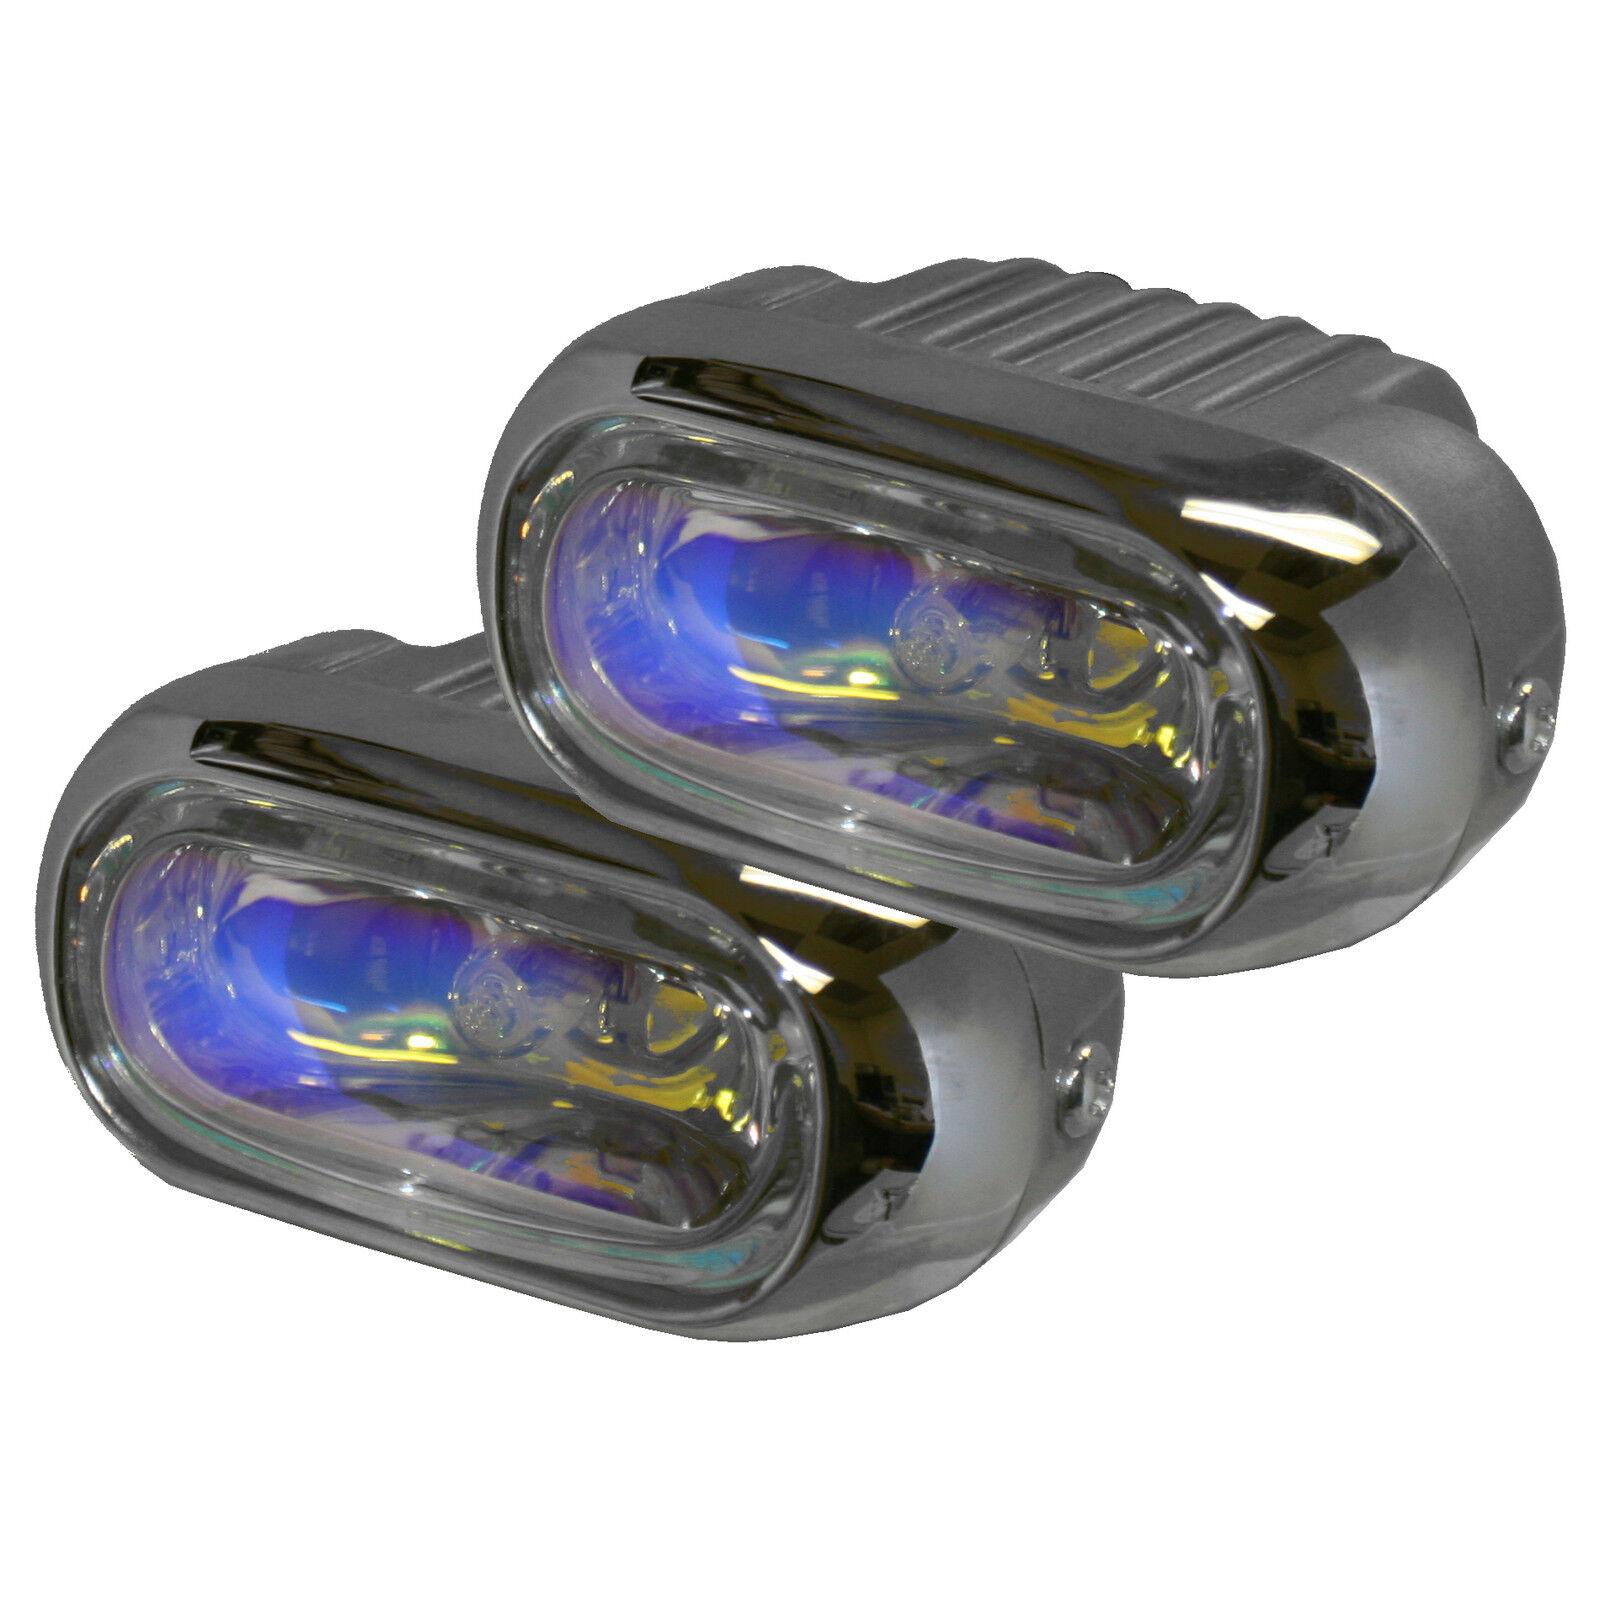 oval fog lights driving lamps w wiring kit fits most cars trucks